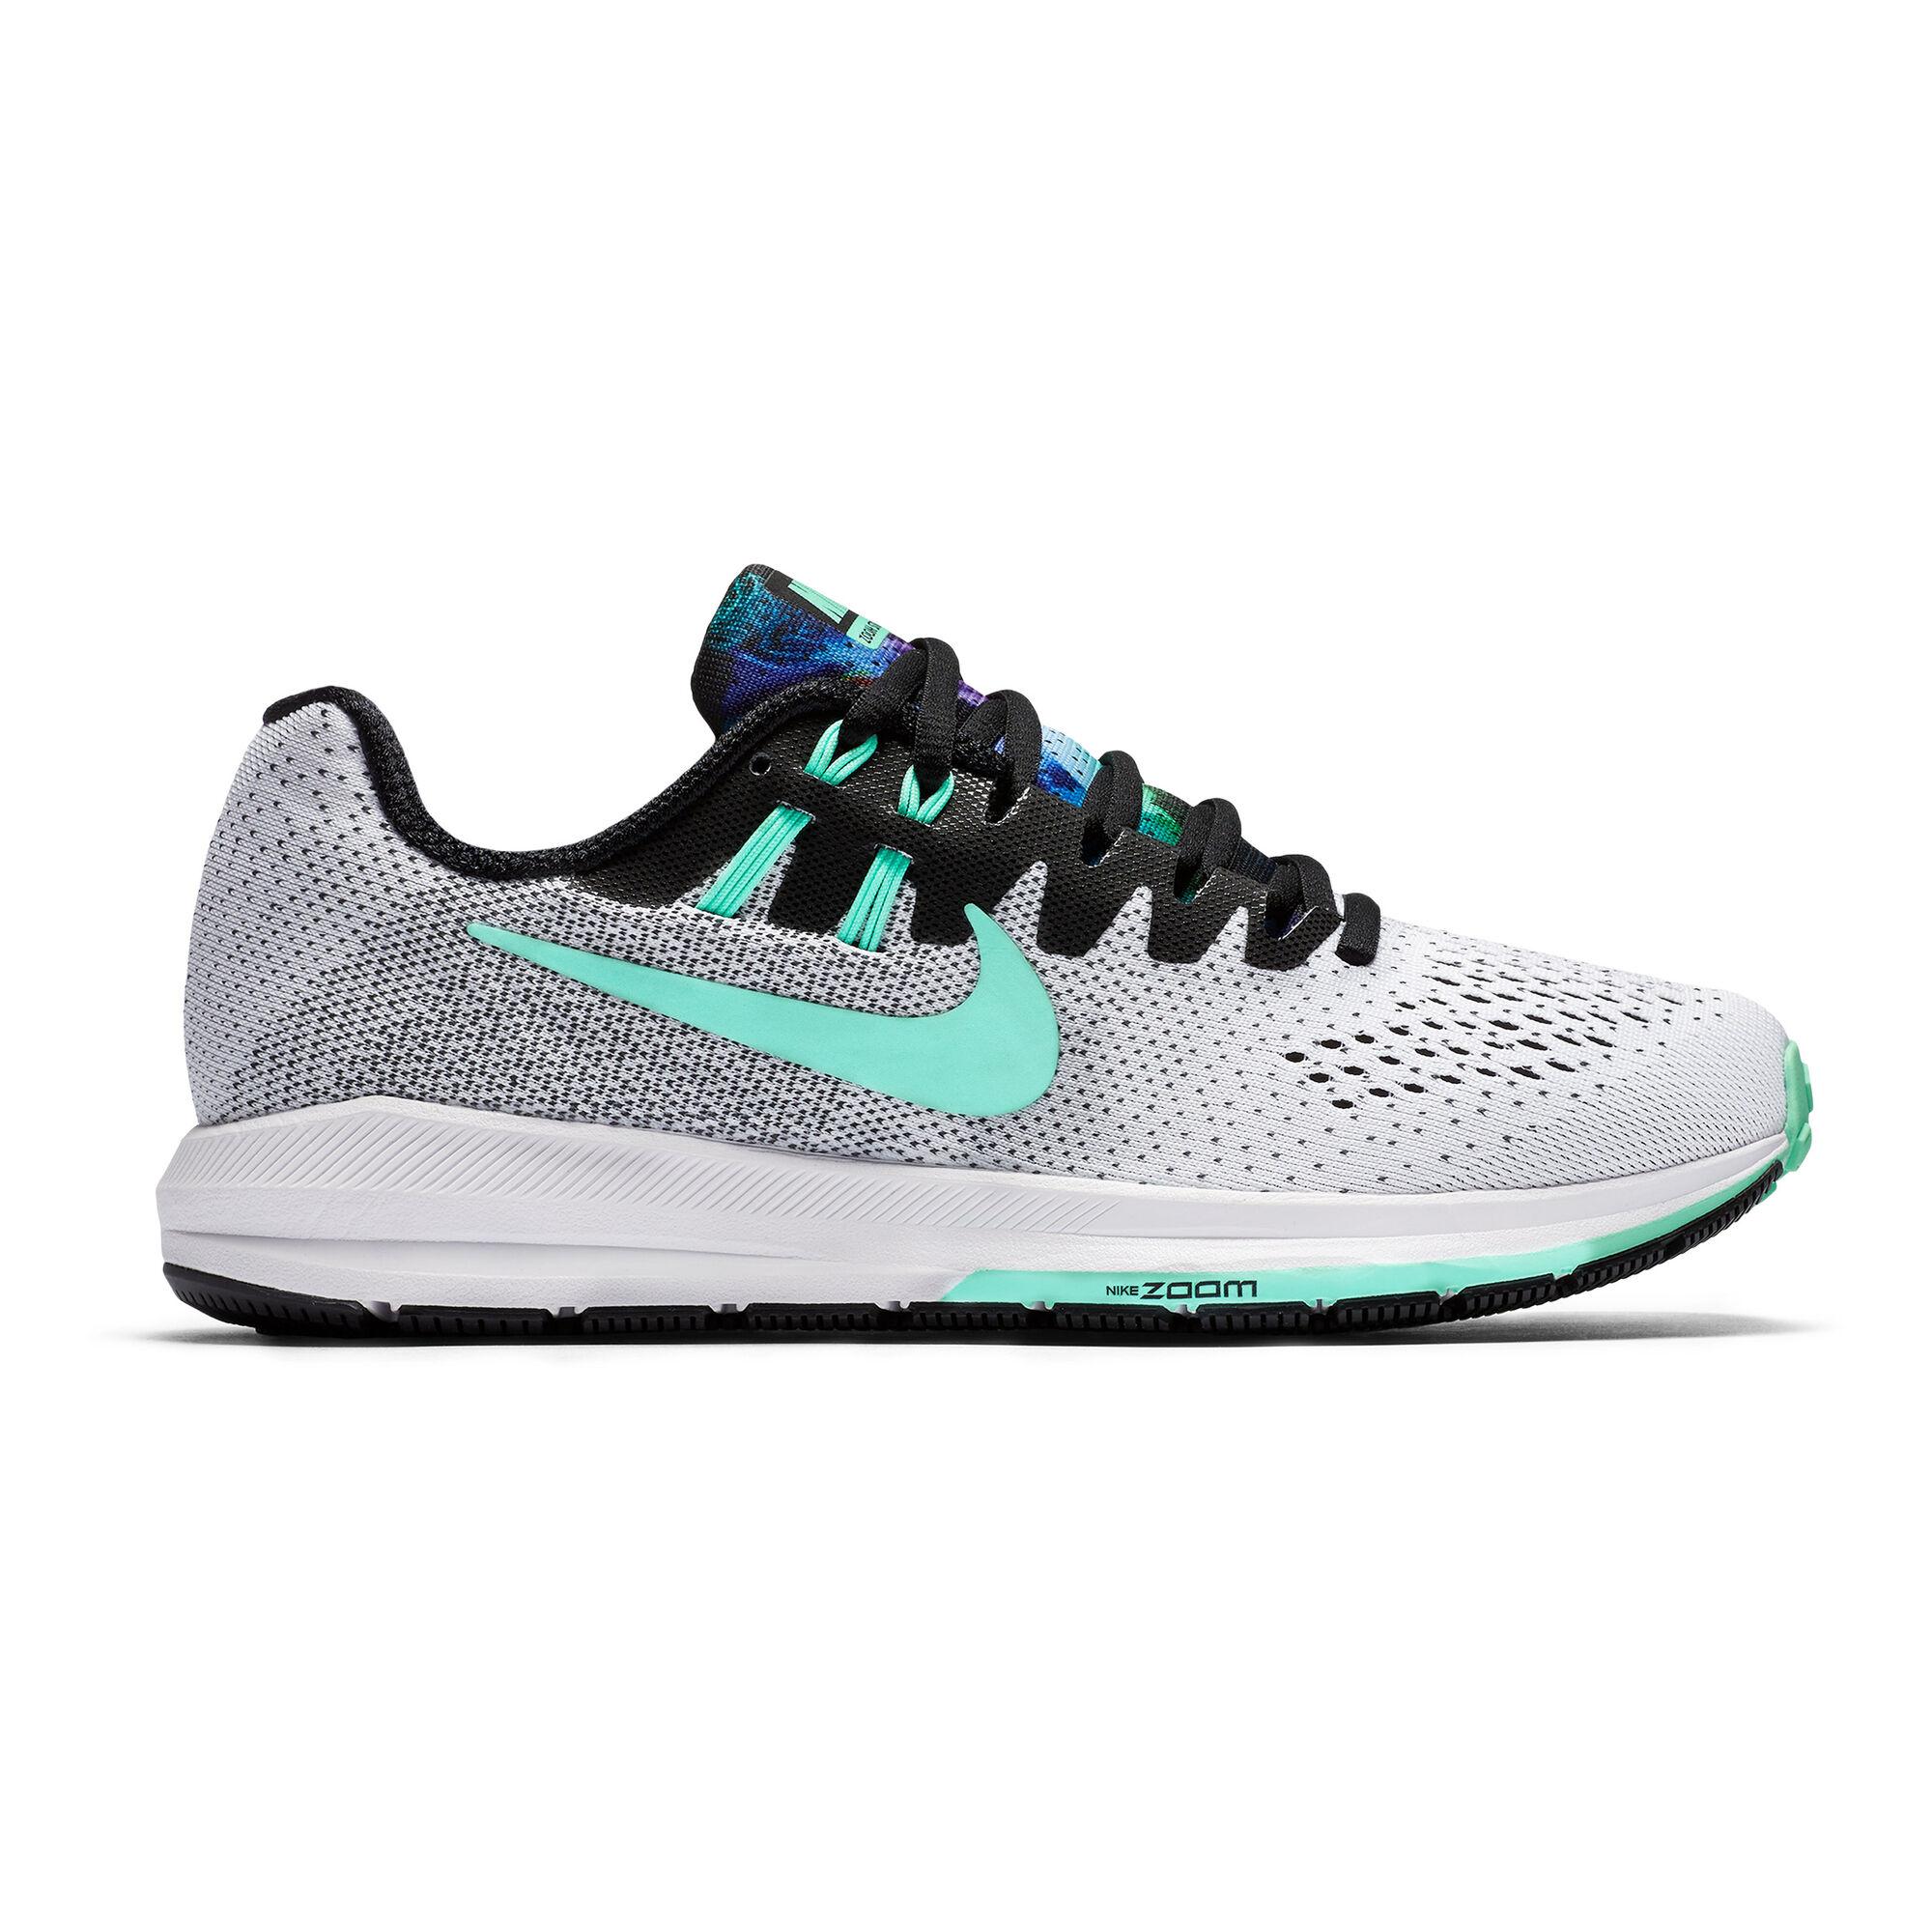 Recuerdo flotador dinámica  buy Nike Air Zoom Structure 20 Solstice Stability Running Shoe Women -  White, Mint online | Jogging-Point